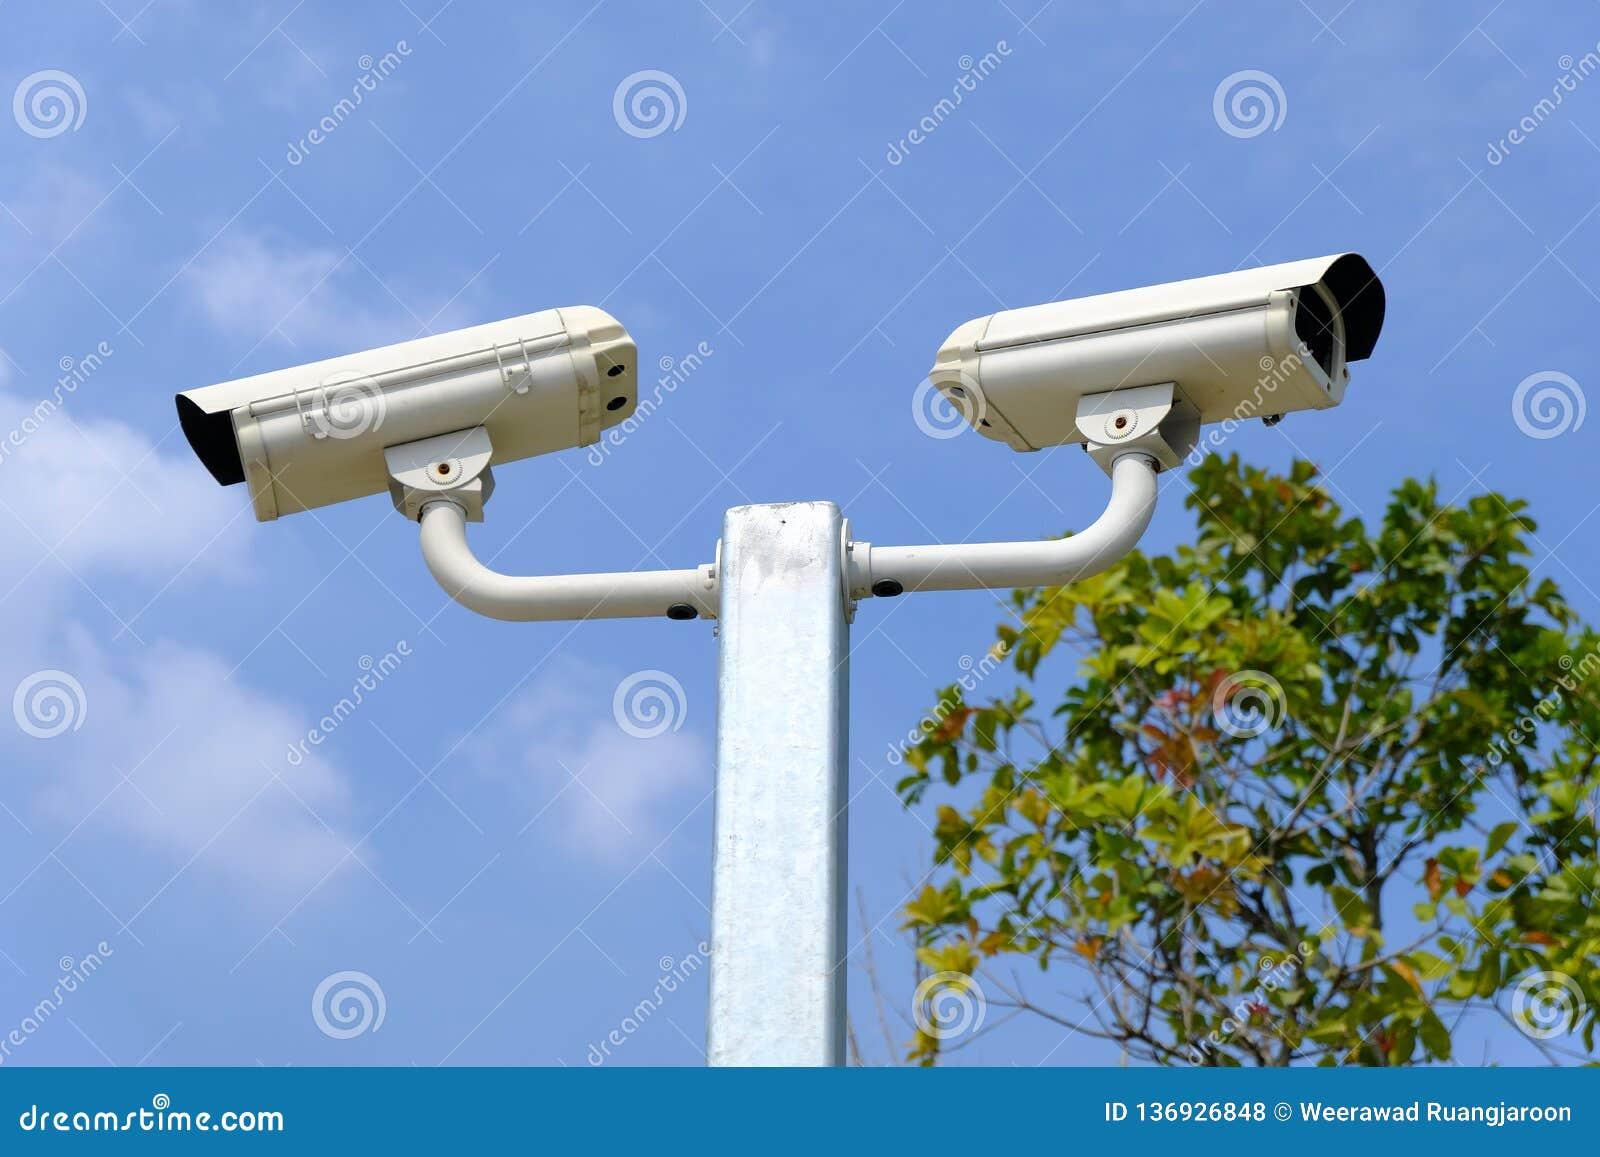 Closed-circuit kamera eller CCTV på himmelbakgrunden